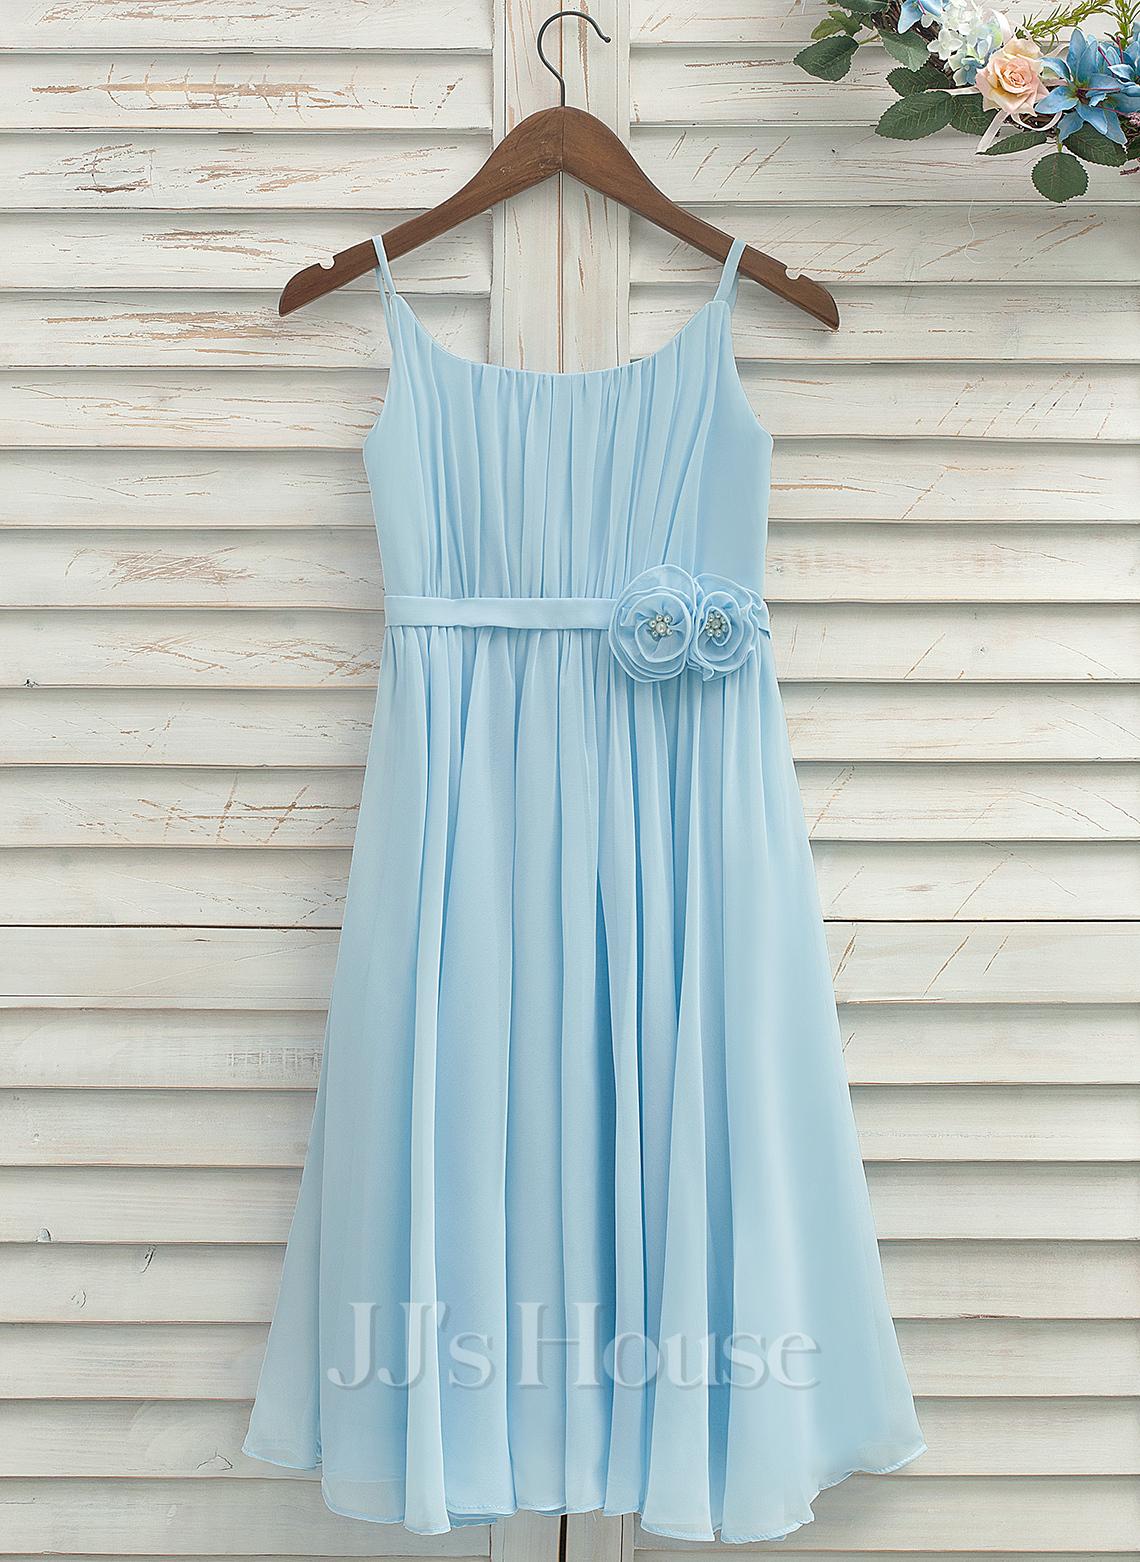 A-Line/Princess Tea-length Flower Girl Dress - Chiffon Sleeveless Straps With Pleated